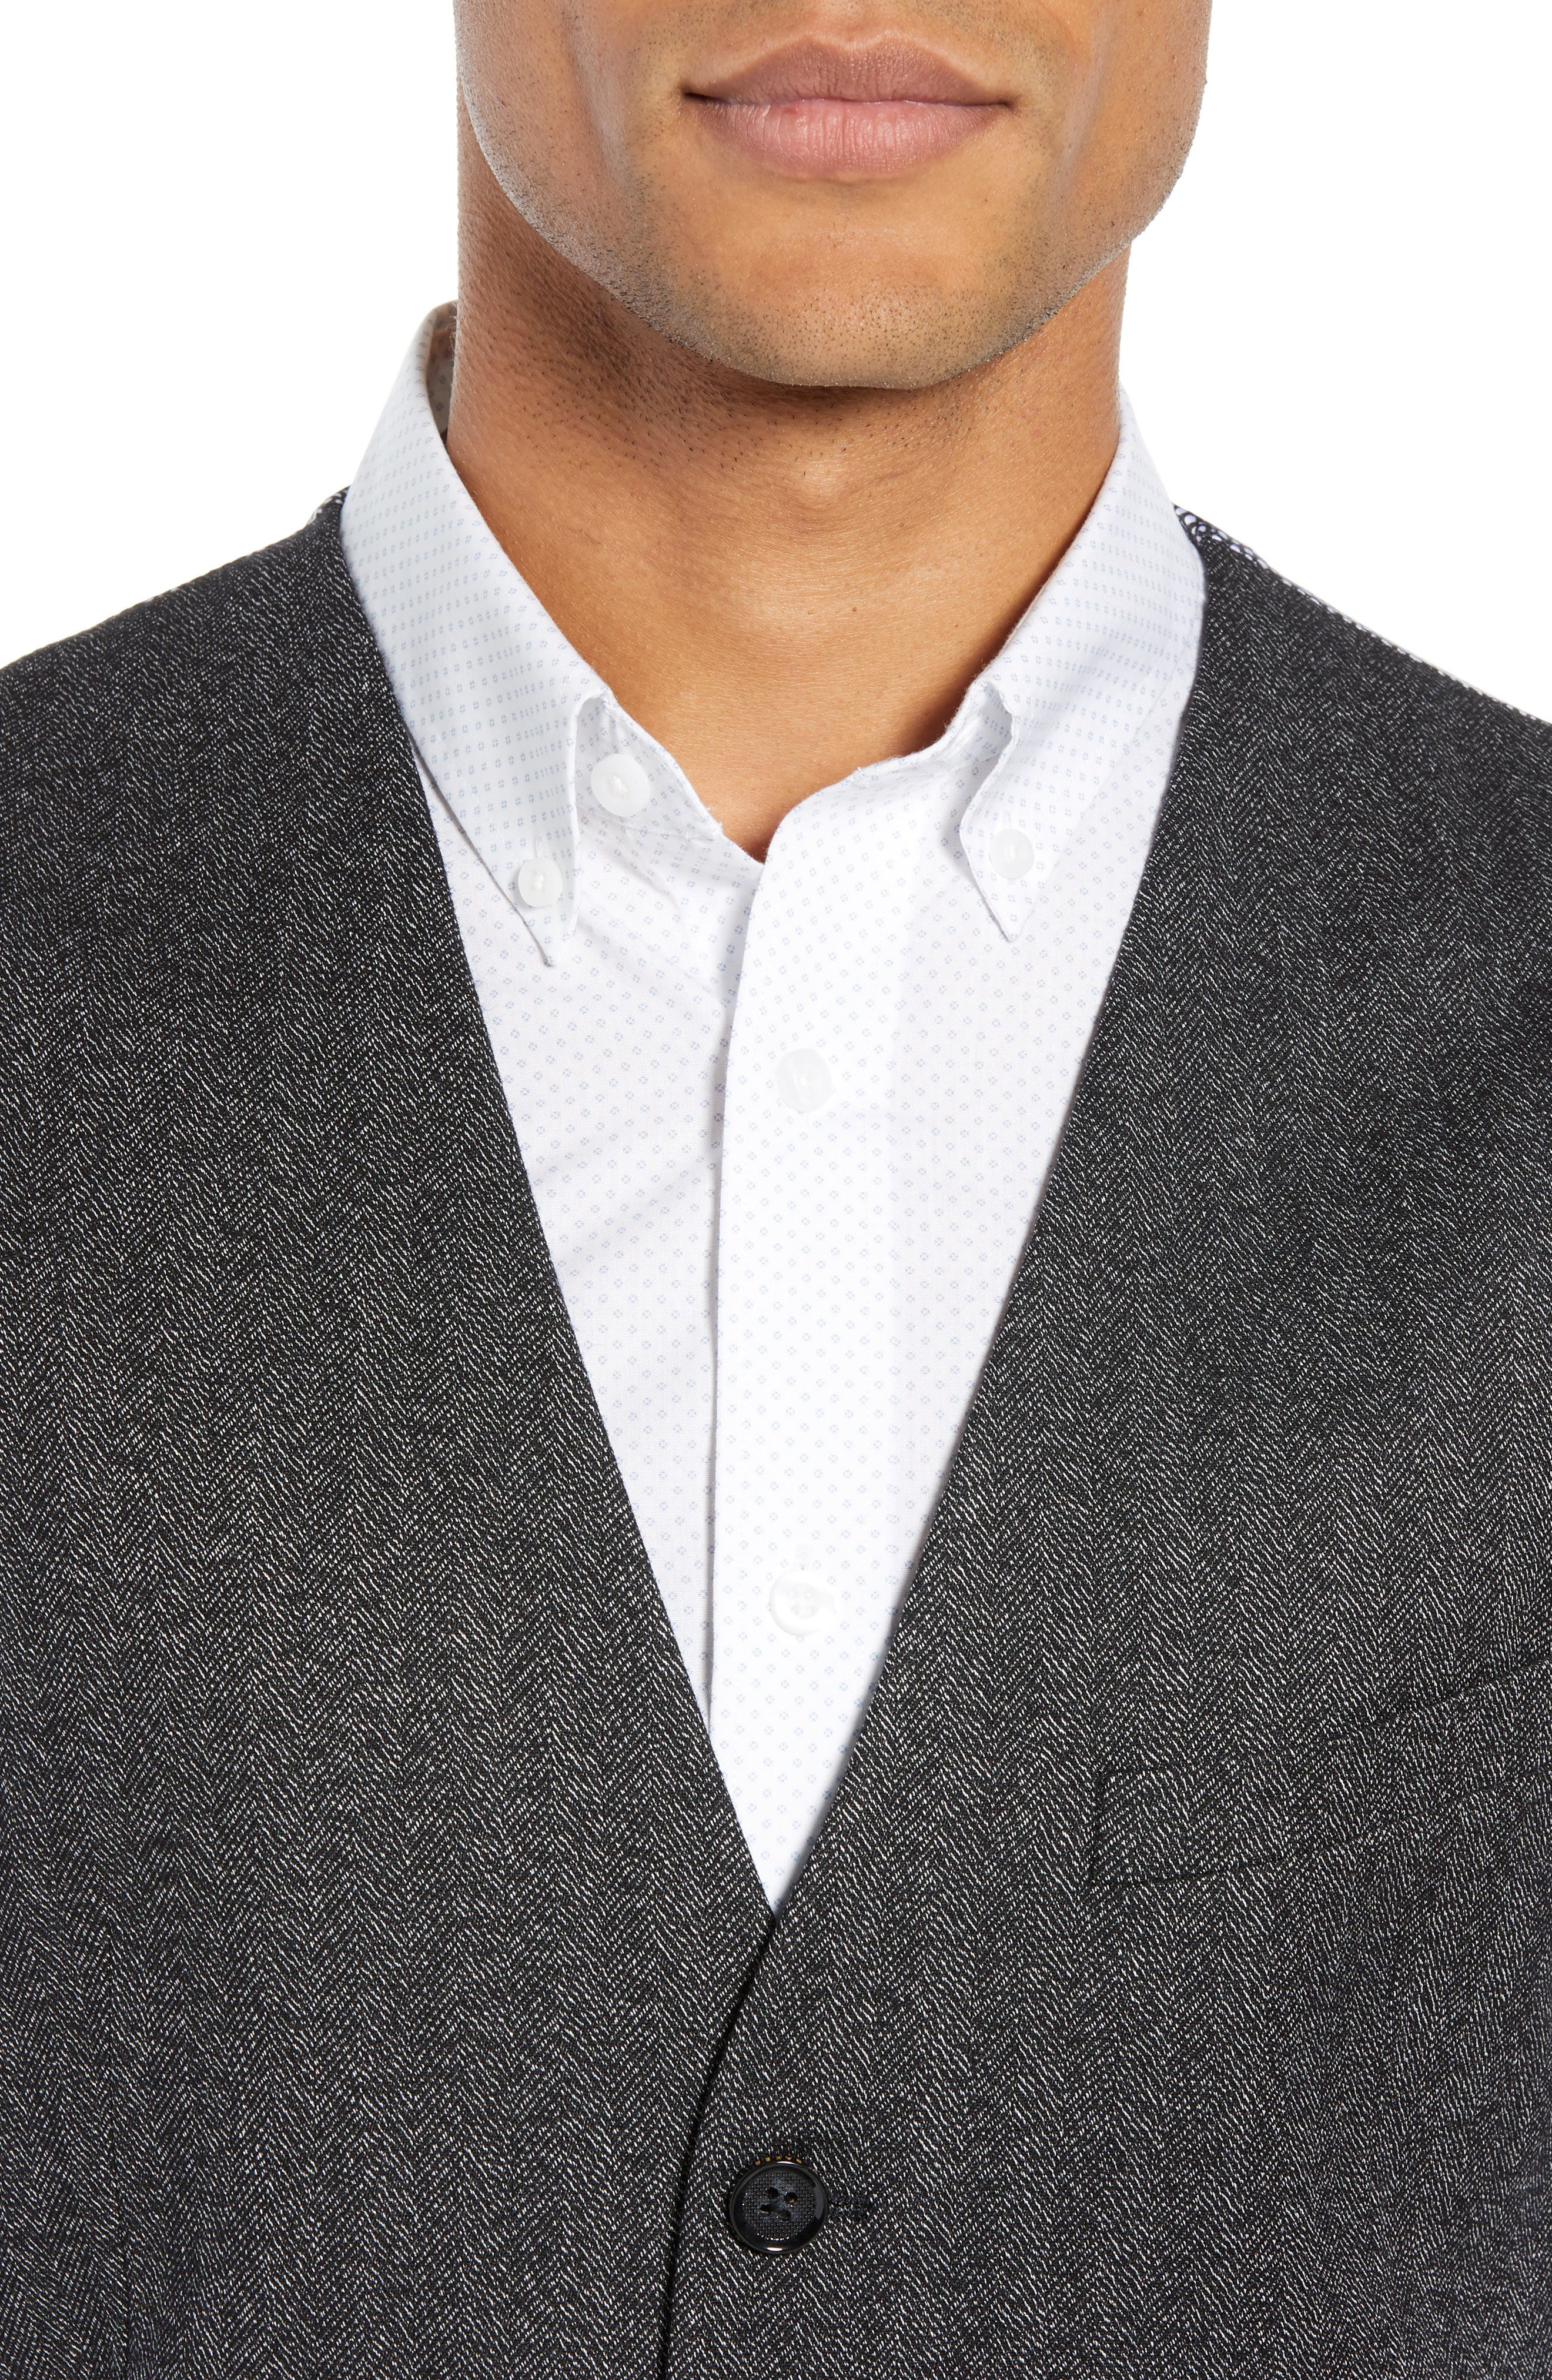 Wenswai Slim Vest,                             Alternate thumbnail 4, color,                             CHARCOAL